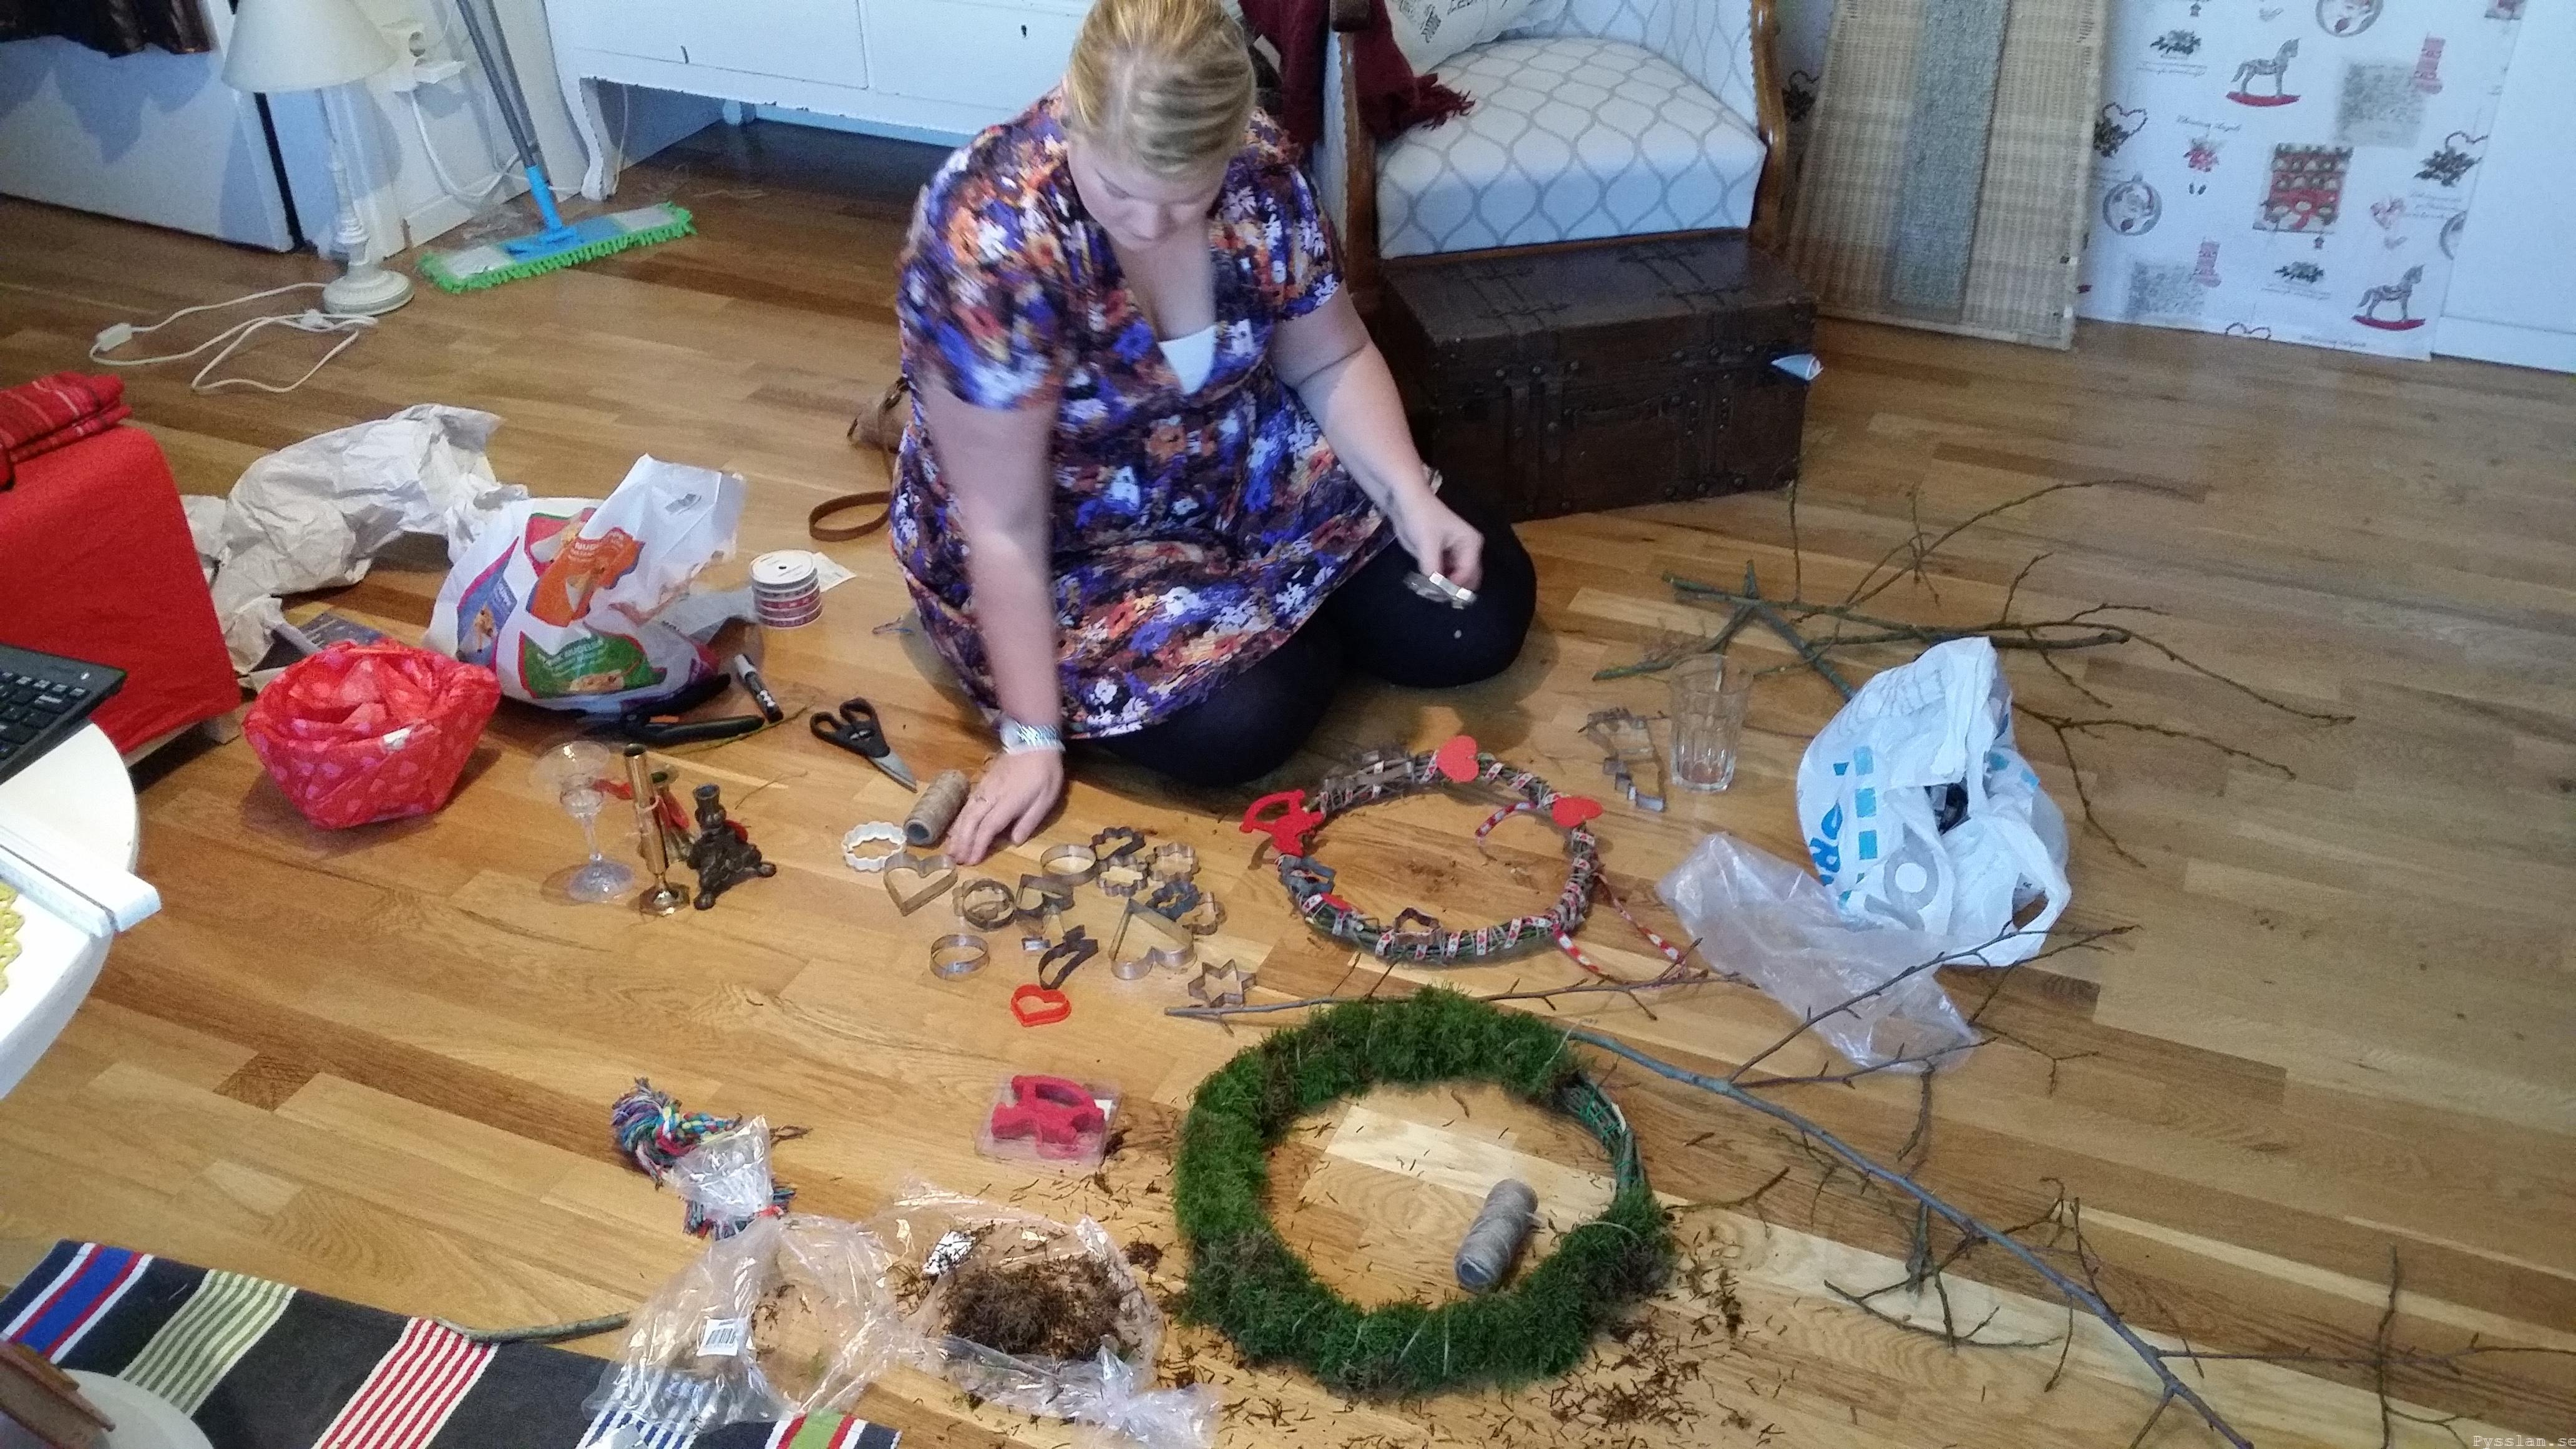 Pysselkaos julkrans mossa band hampa hjärtan pepparkaksformar pysslan blogg